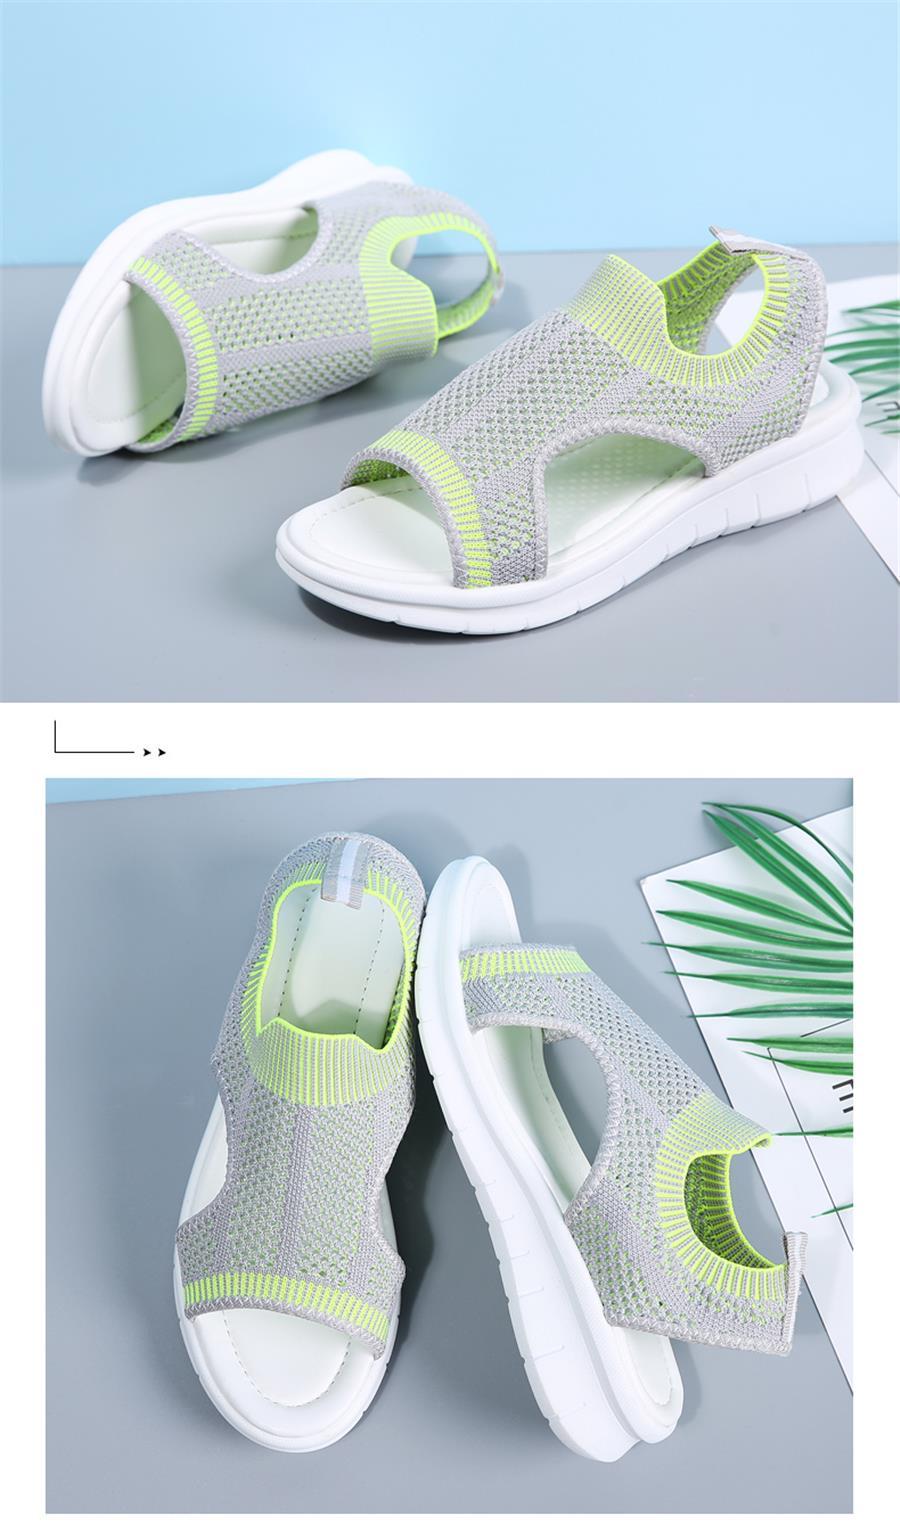 STQ Women sandals 2019 female shoes women summer wedge comfort sandals ladies flat slingback flat sandals women sandalias 7739